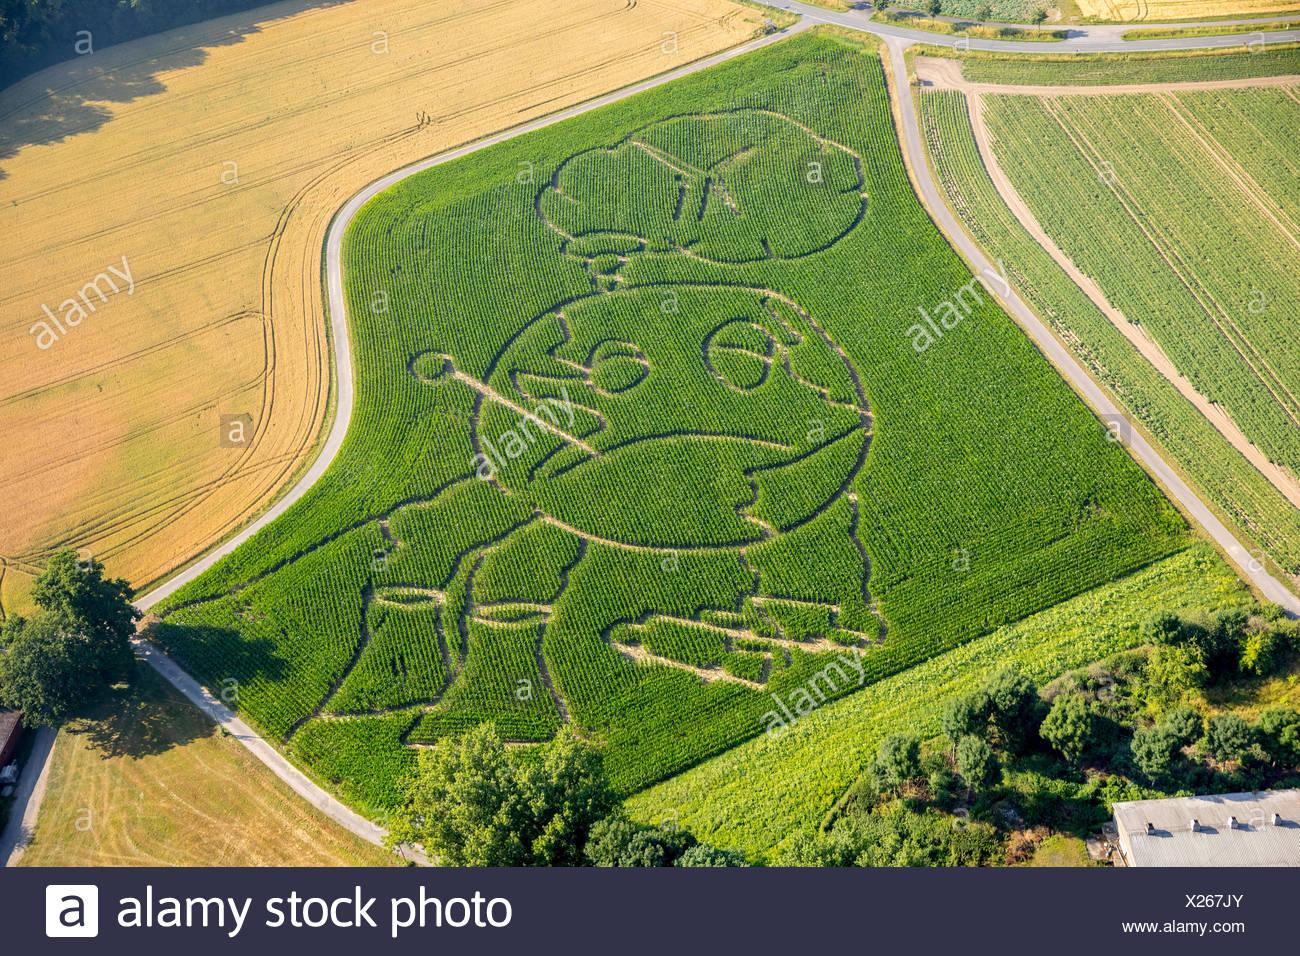 Corn maze, global warming, Selm, Ruhr area, North Rhine-Westphalia, Germany - Stock Image